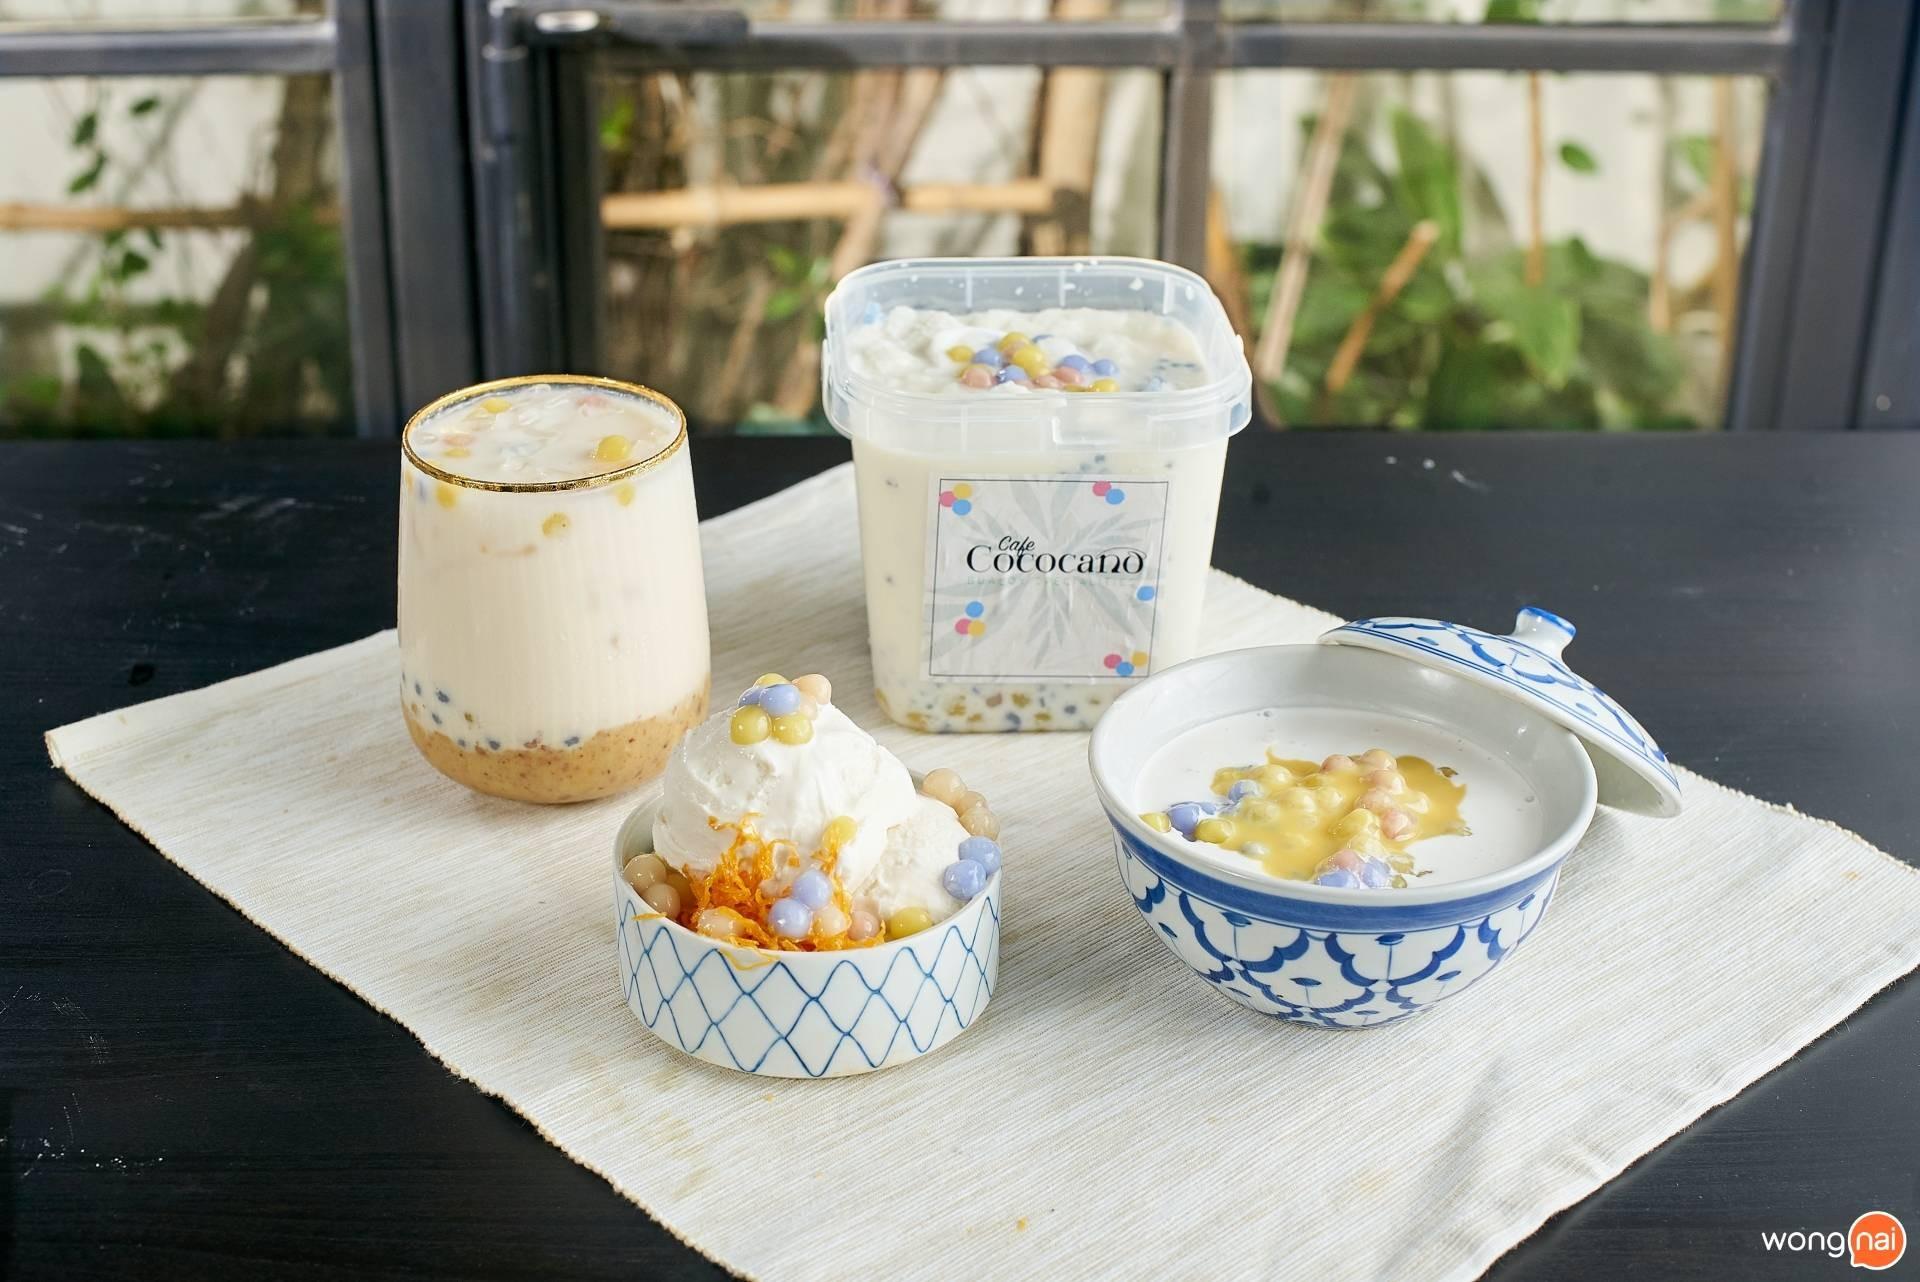 Cafe Cococano คาเฟ่เครื่องดื่มมะพร้าว ข้าวคลุกกะปิสูตรแม่ สูตรเด็ดกว่า 7 ปี และลาเต้มะพร้าวเจ้าแรกของไทย